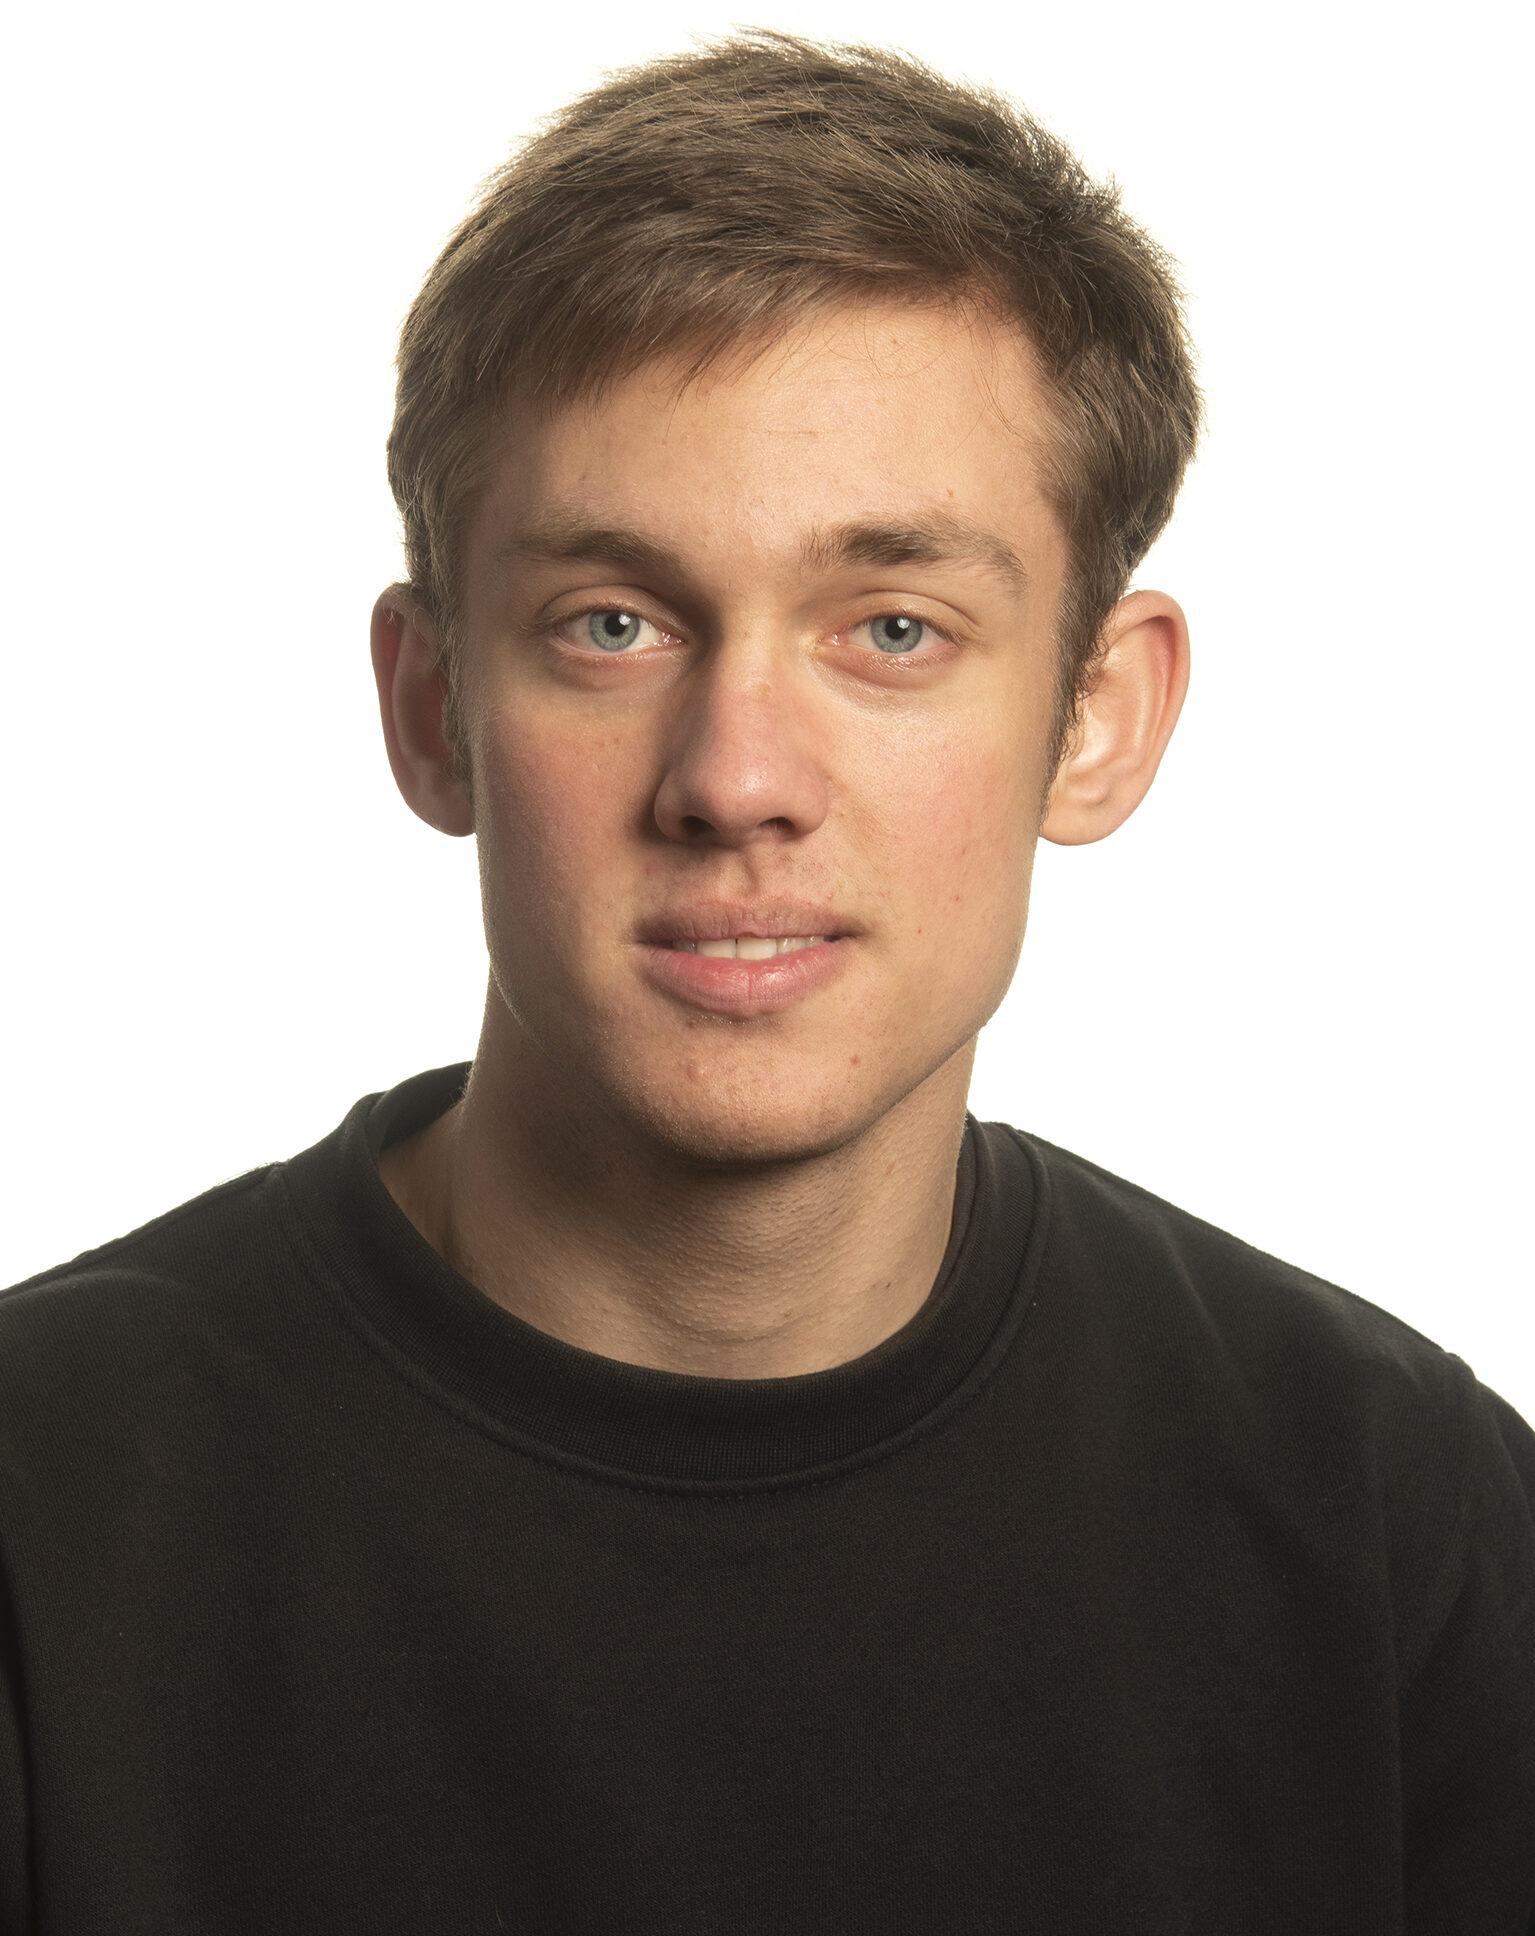 Mathias Gandrup Jensen